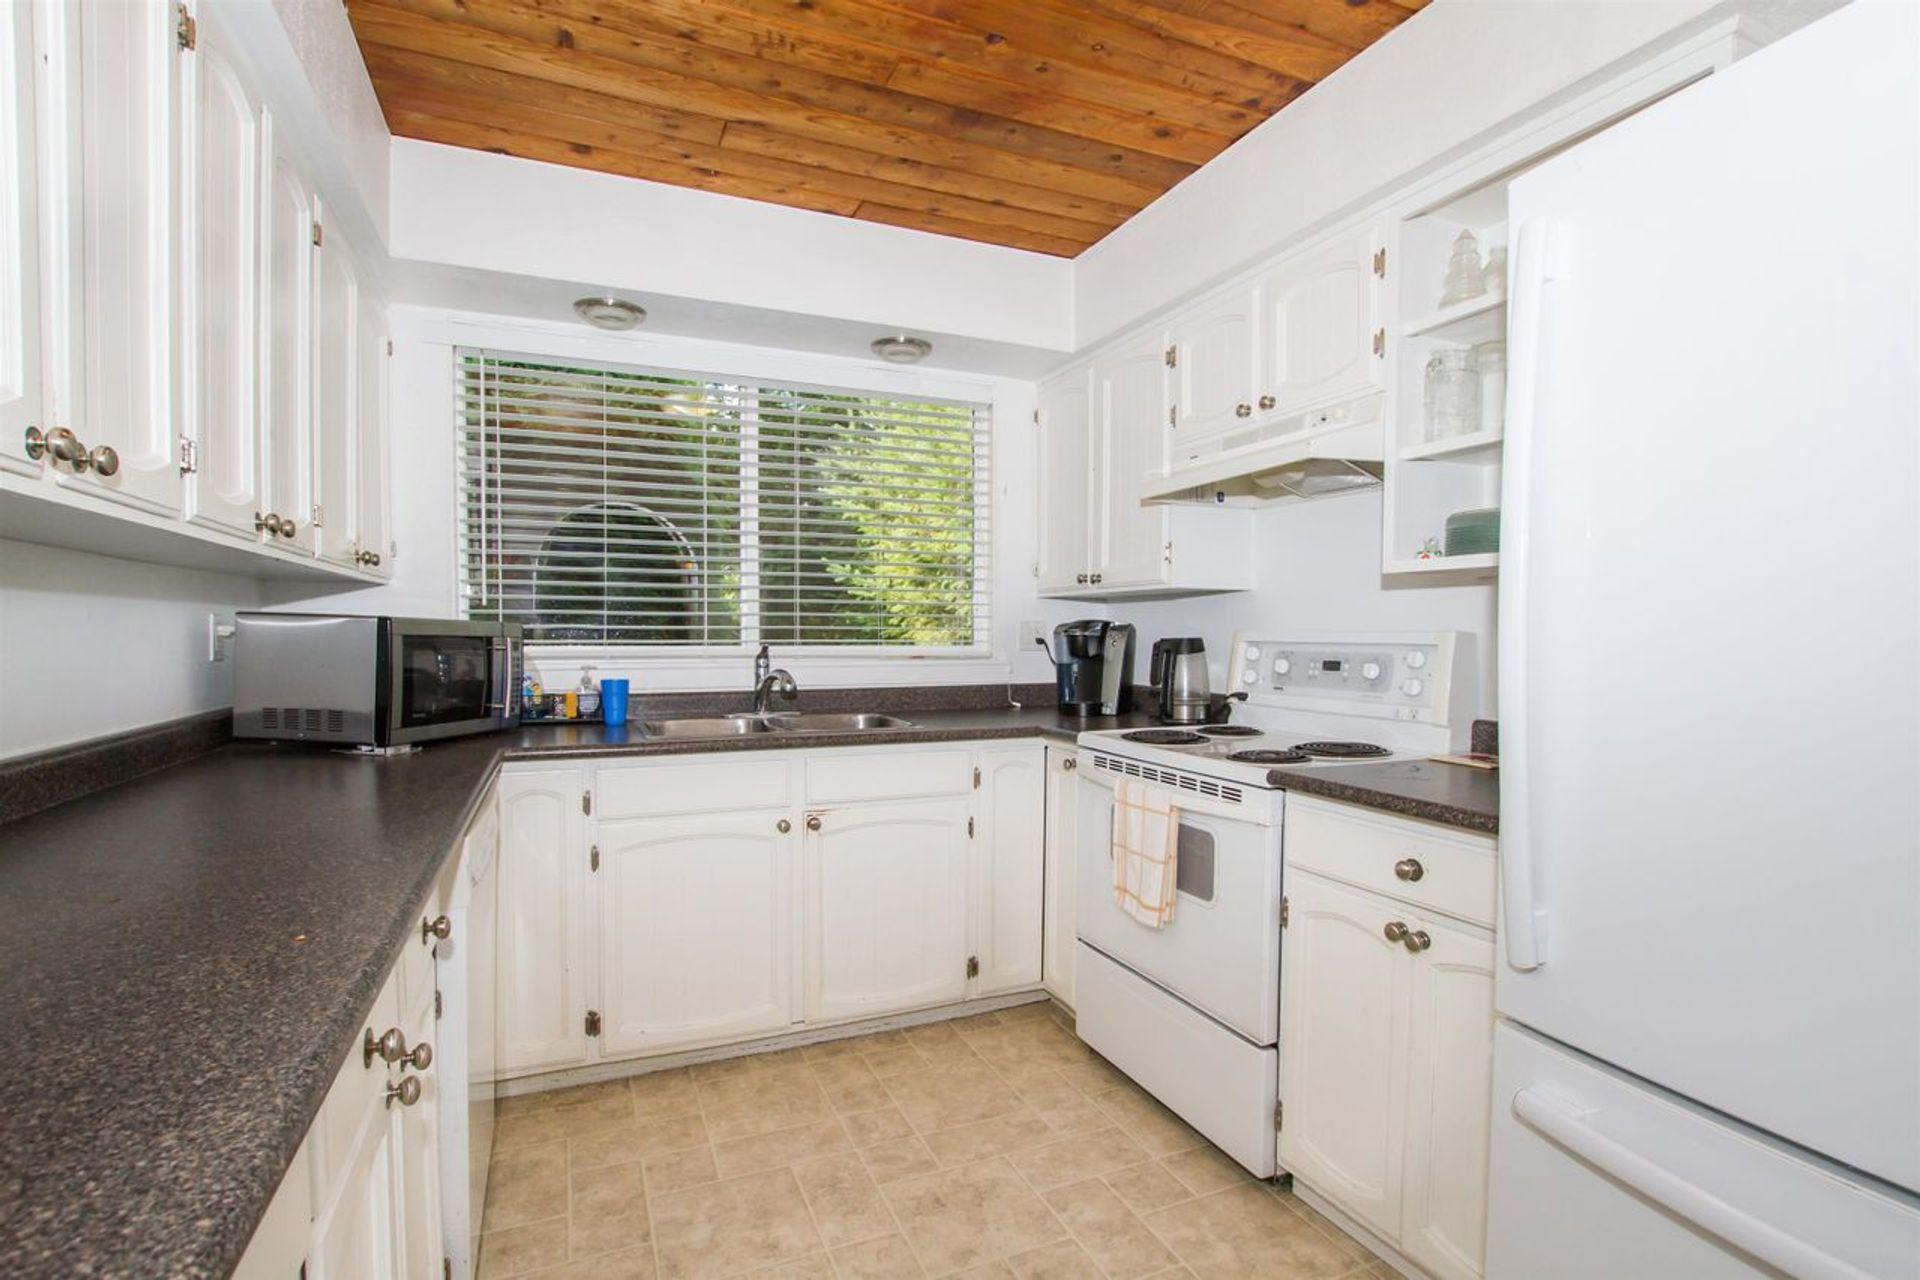 2040-diamond-road-garibaldi-estates-squamish-13 at 2040 Diamond Road, Garibaldi Estates, Squamish